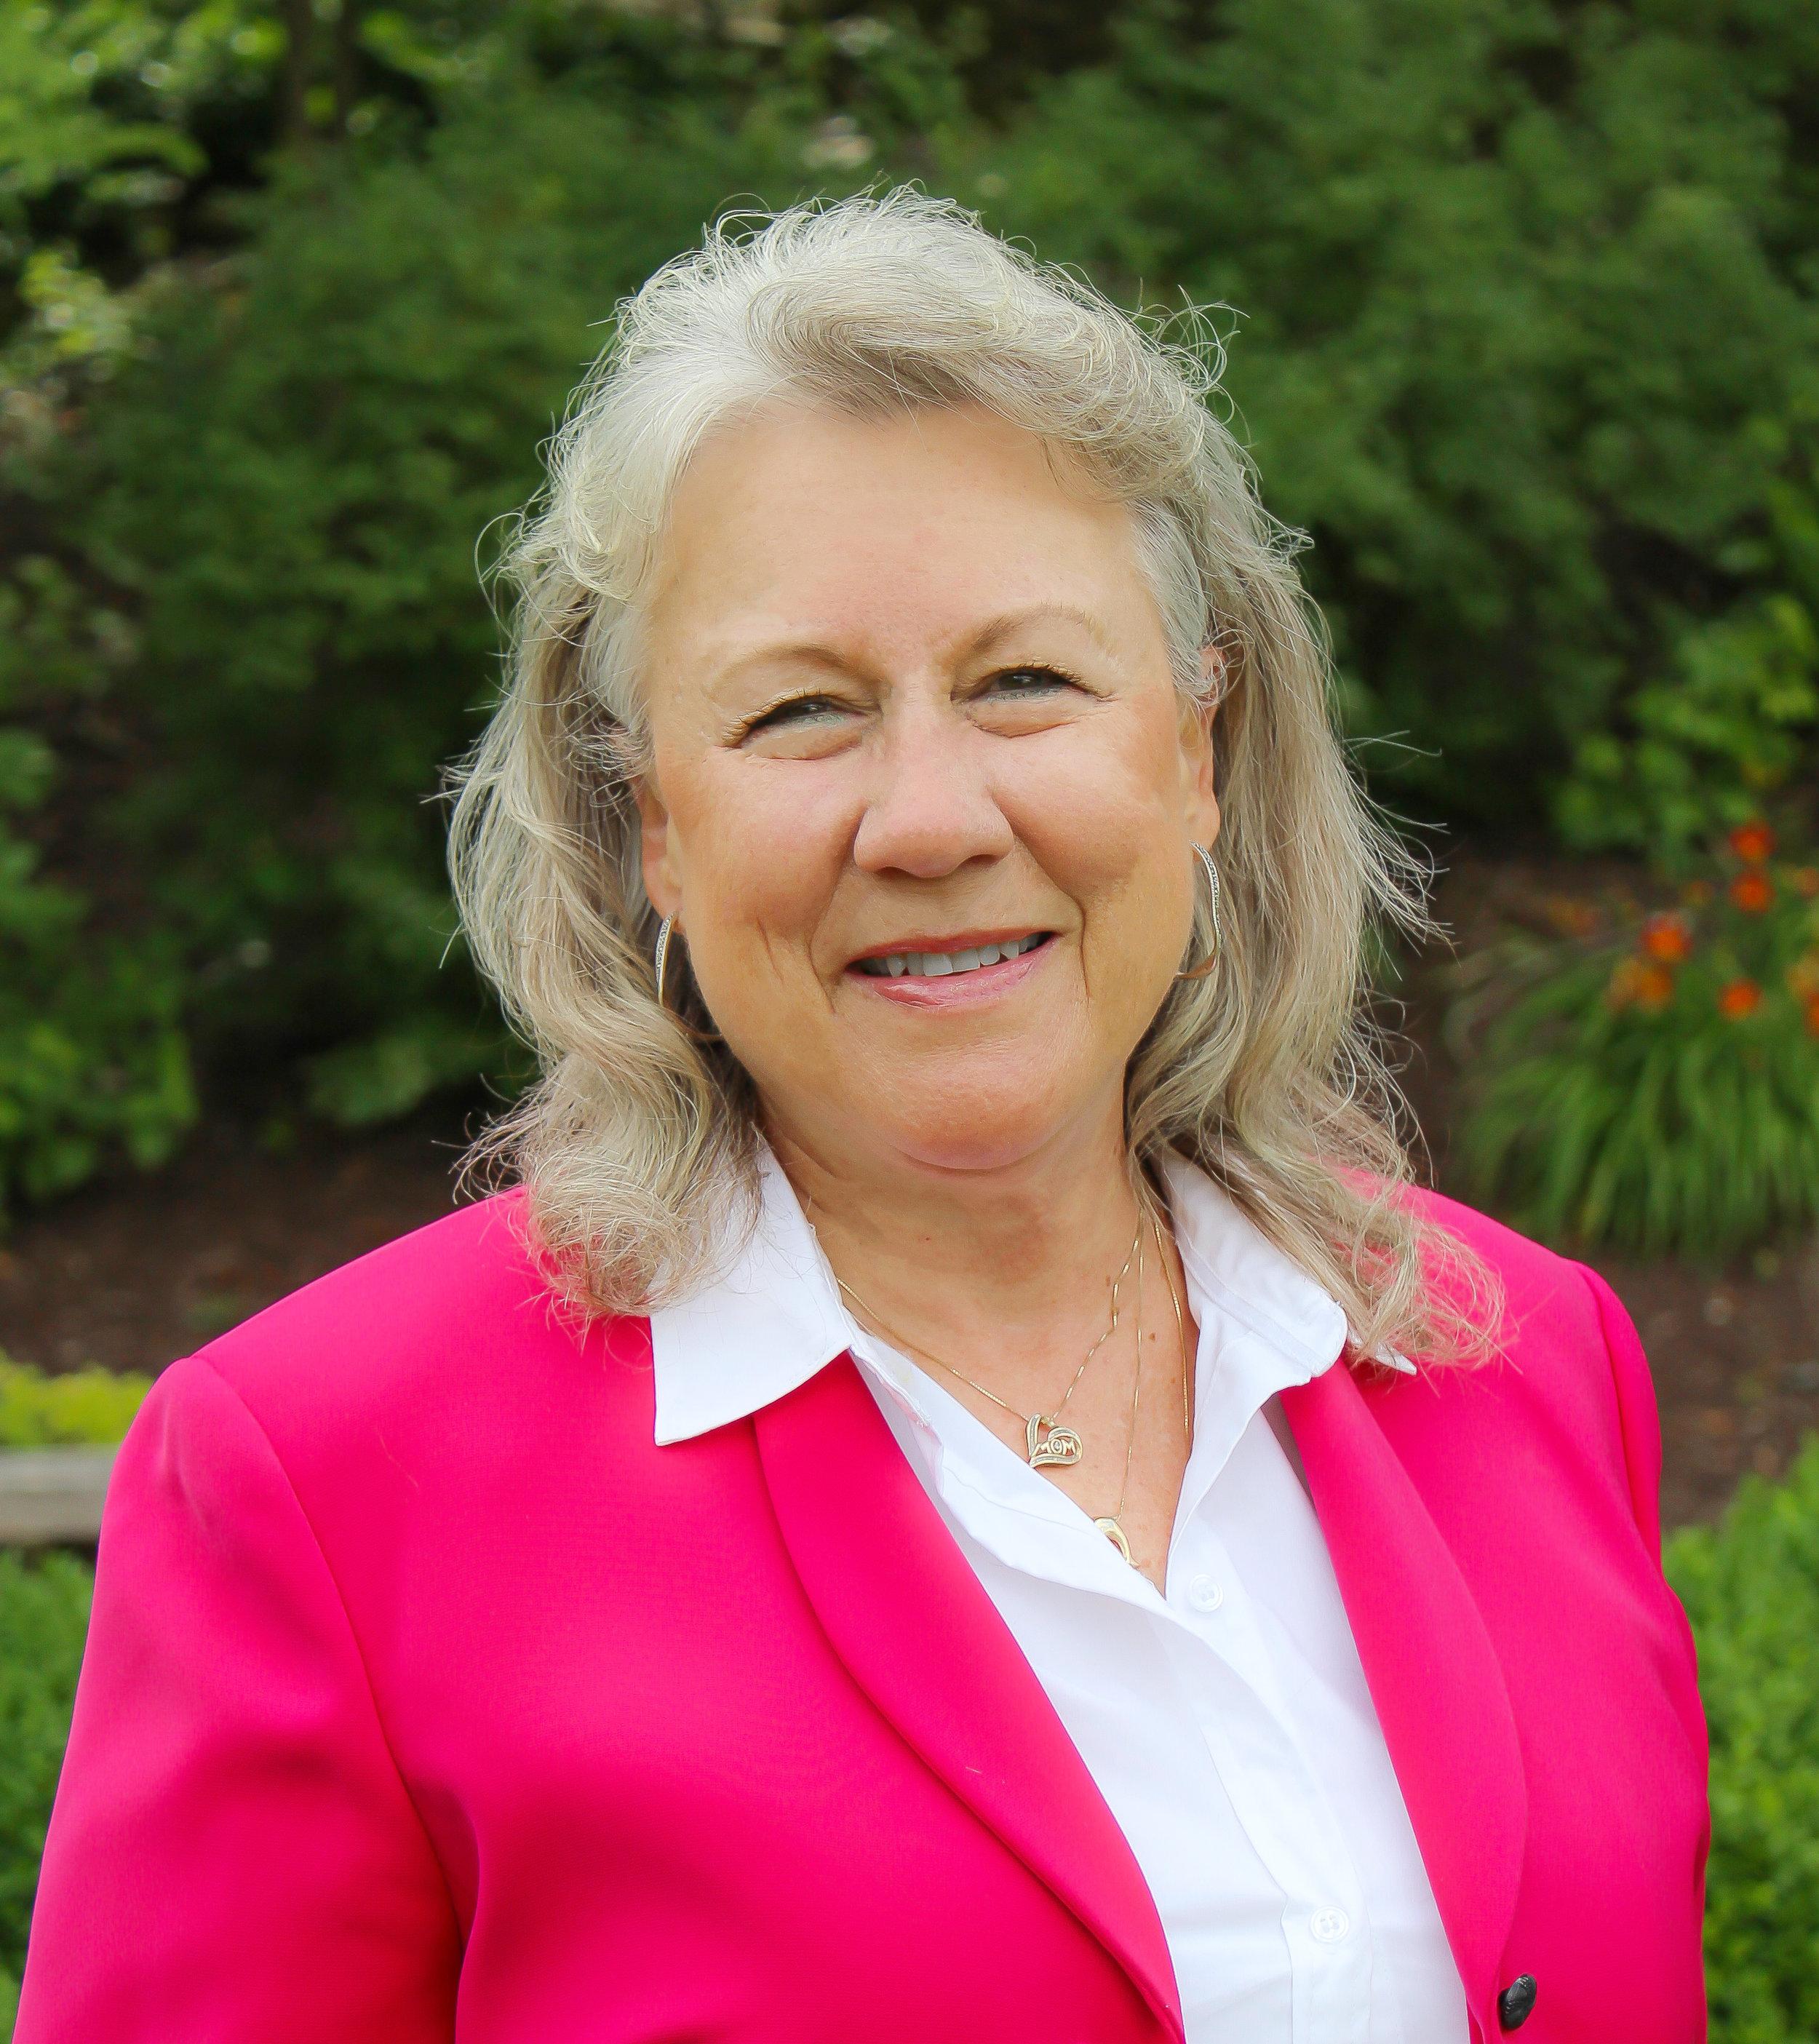 Annette Wallace